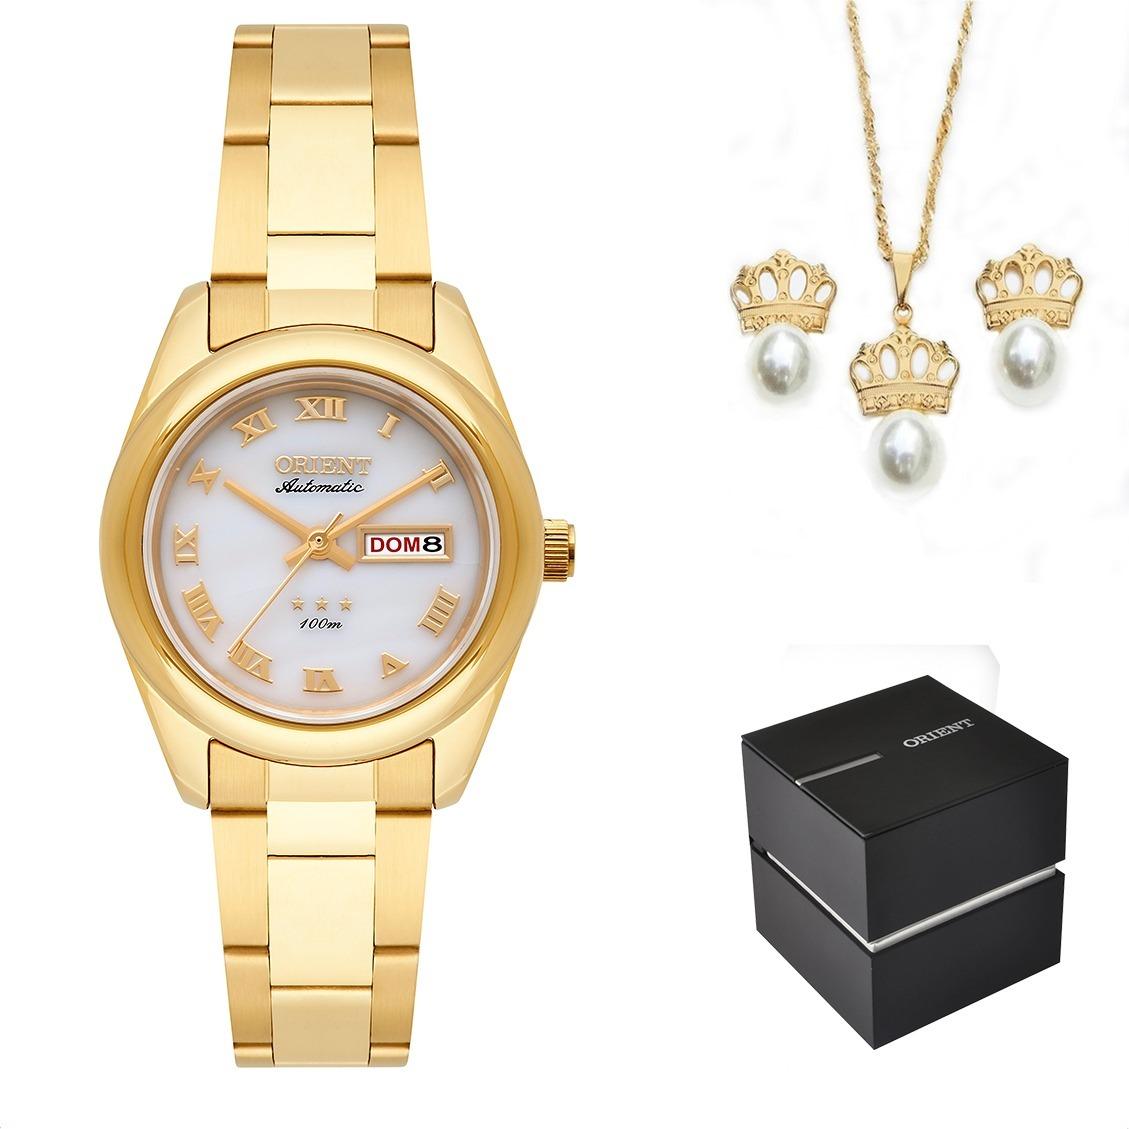 8d1d1336906 kit relógio orient feminino automático 559gp009 b3kx + nota. Carregando  zoom.